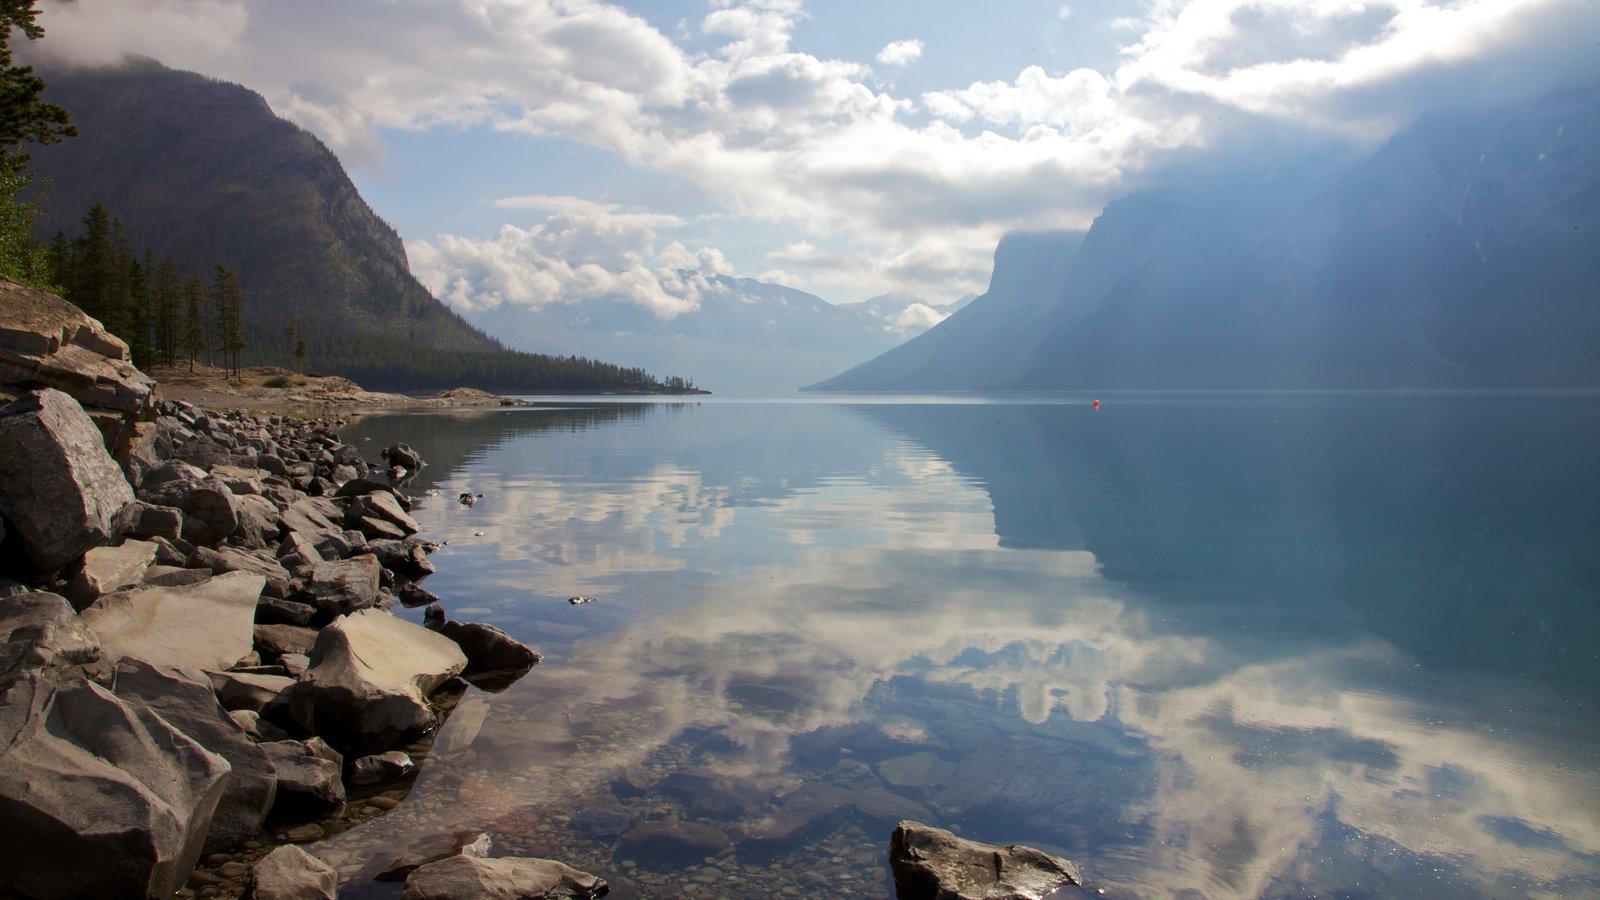 Lake Minnewanka showing mountains, landscape views and a lake or waterhole